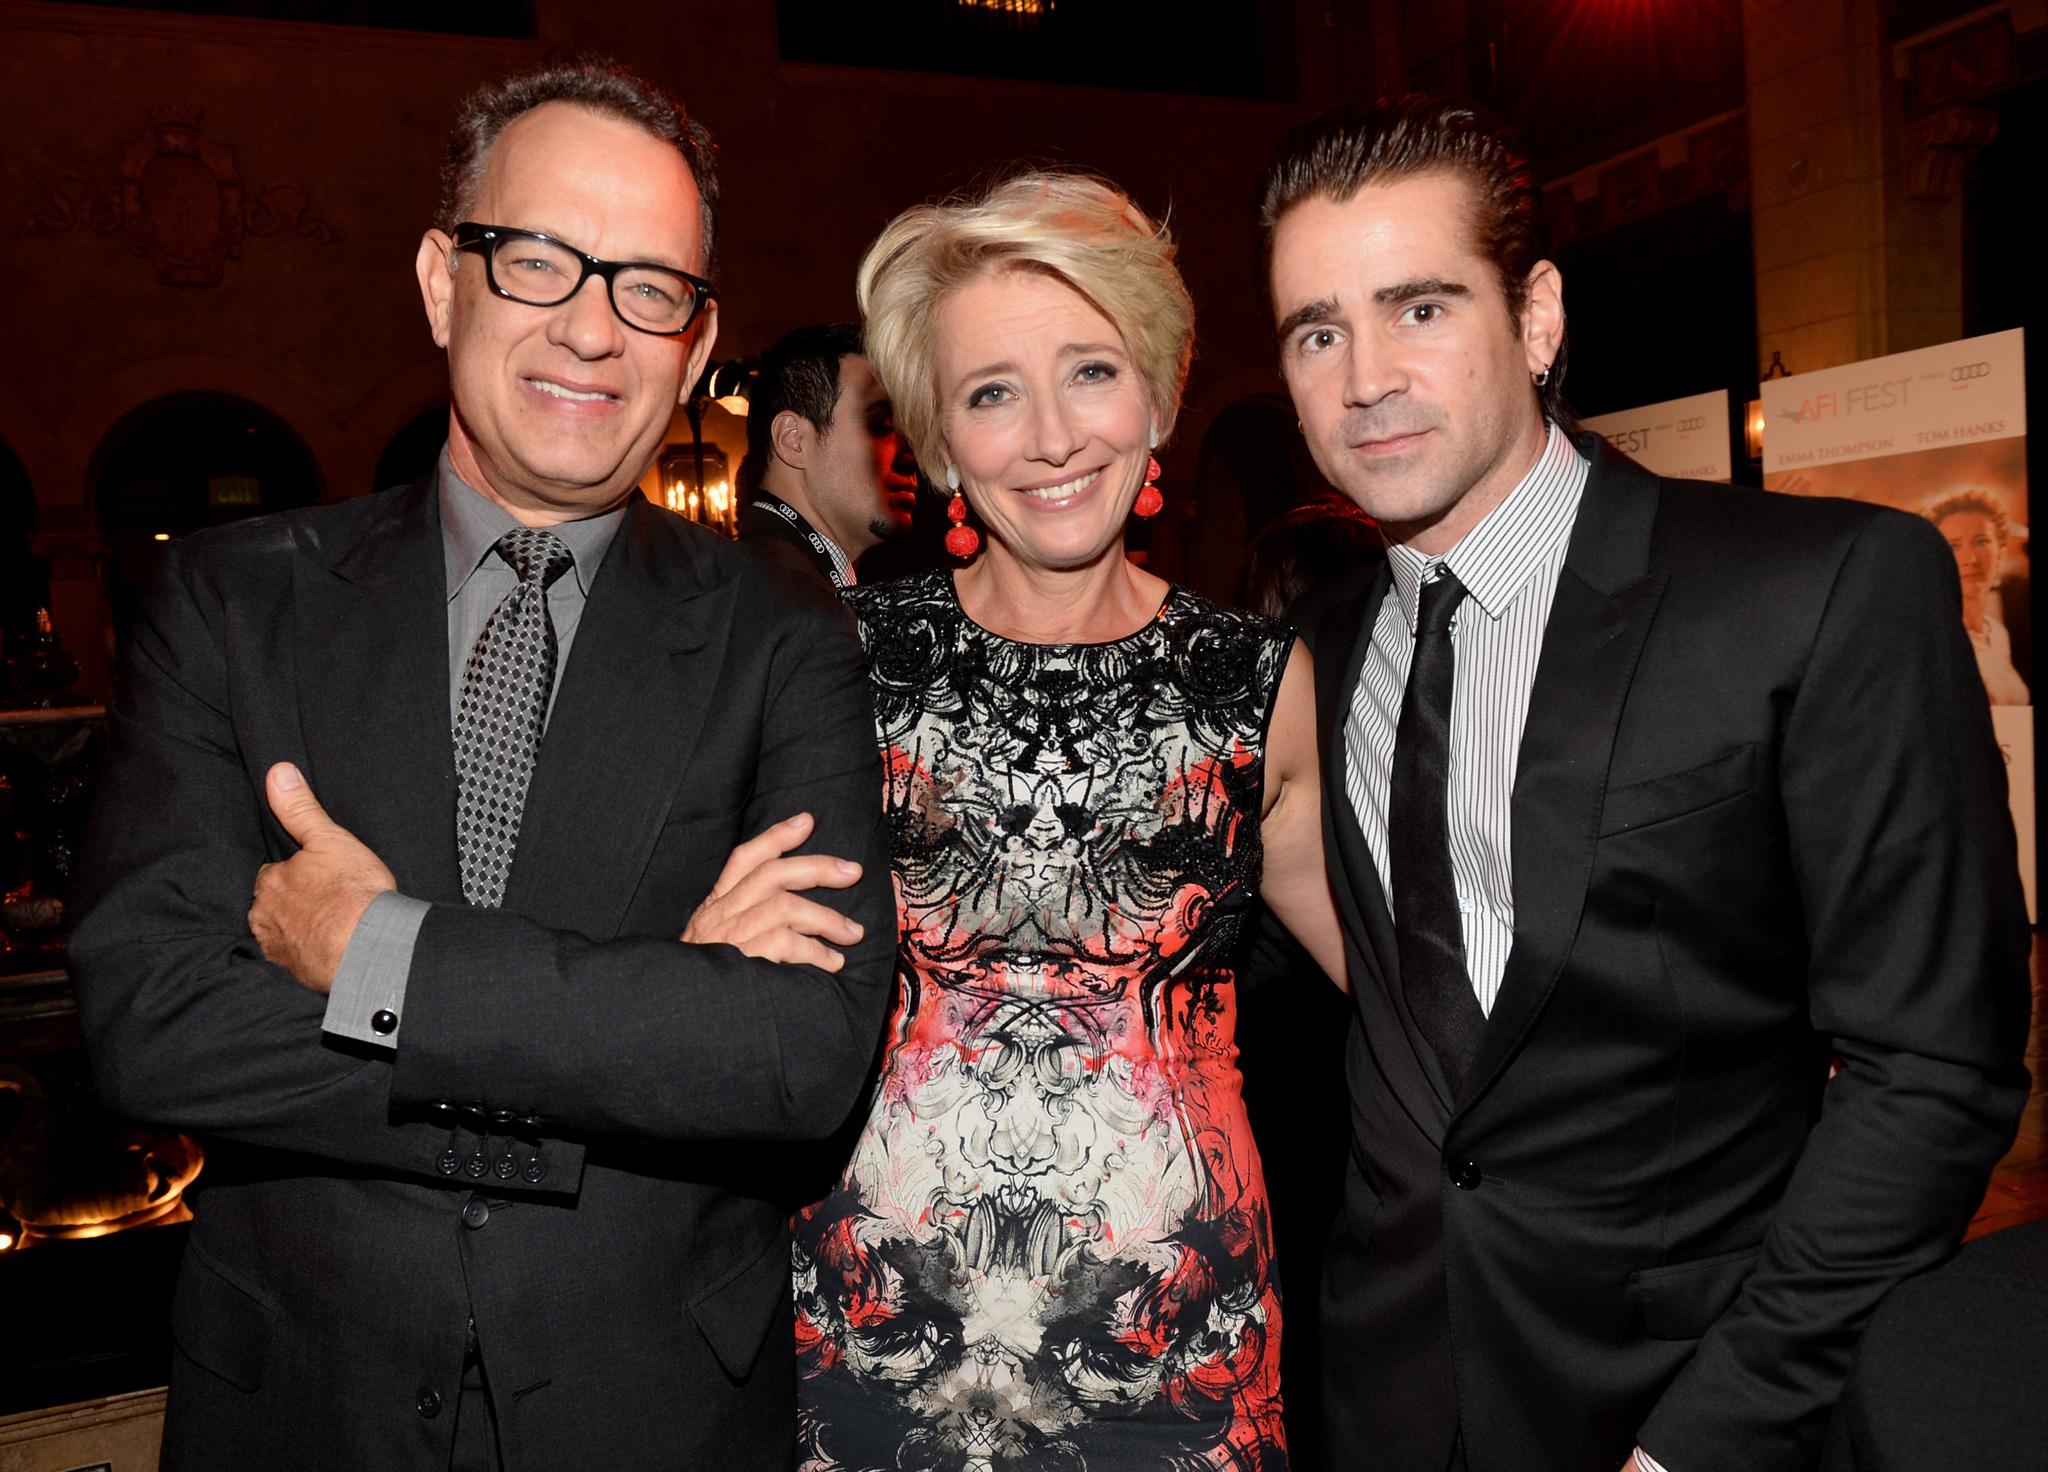 Tom Hanks, Emma Thompson and Colin Farrell at event of Isgelbeti pona Benksa (2013)